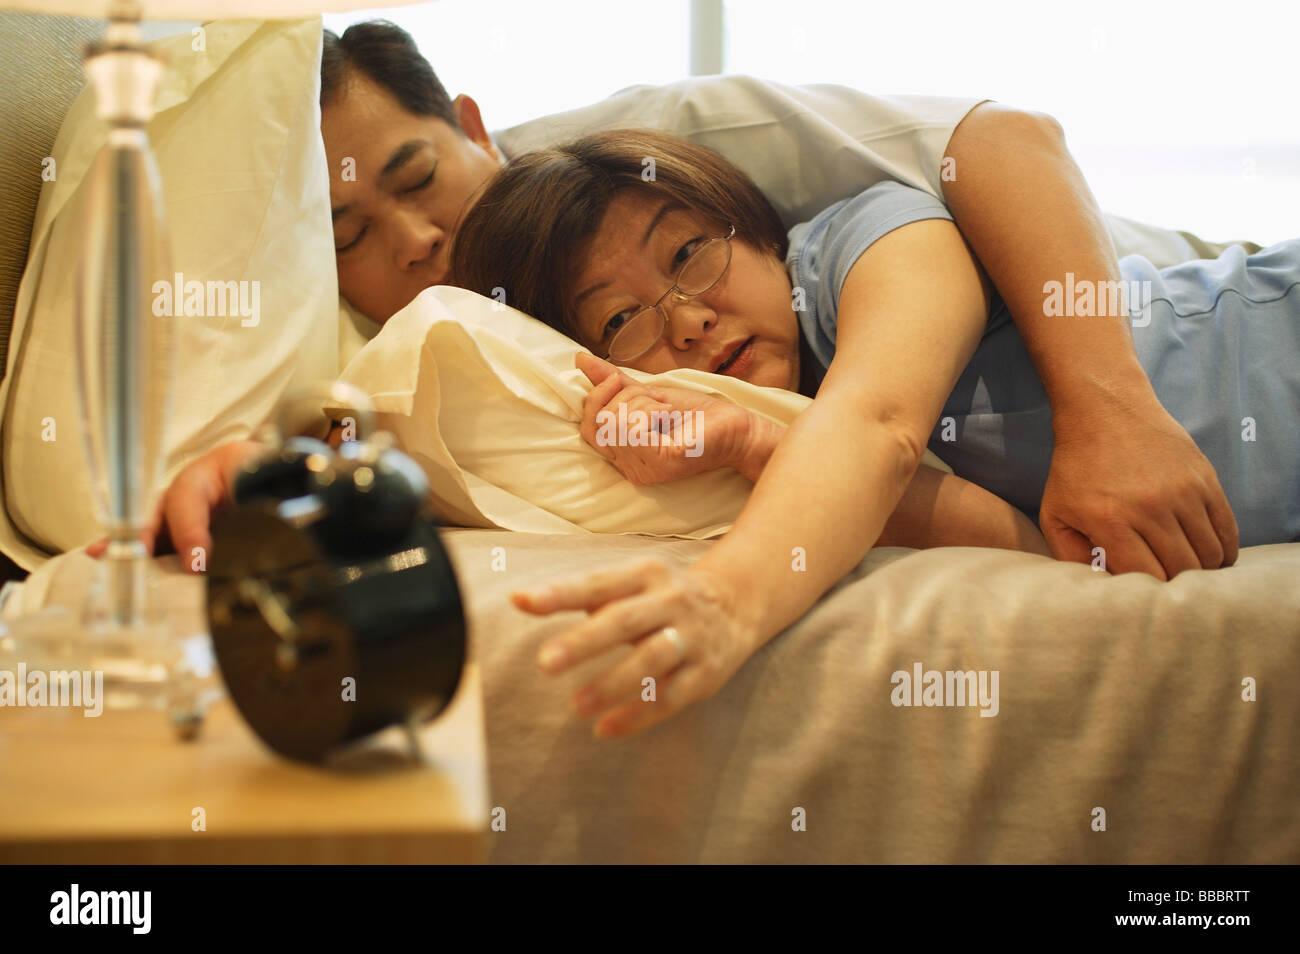 Sleeping asian mature